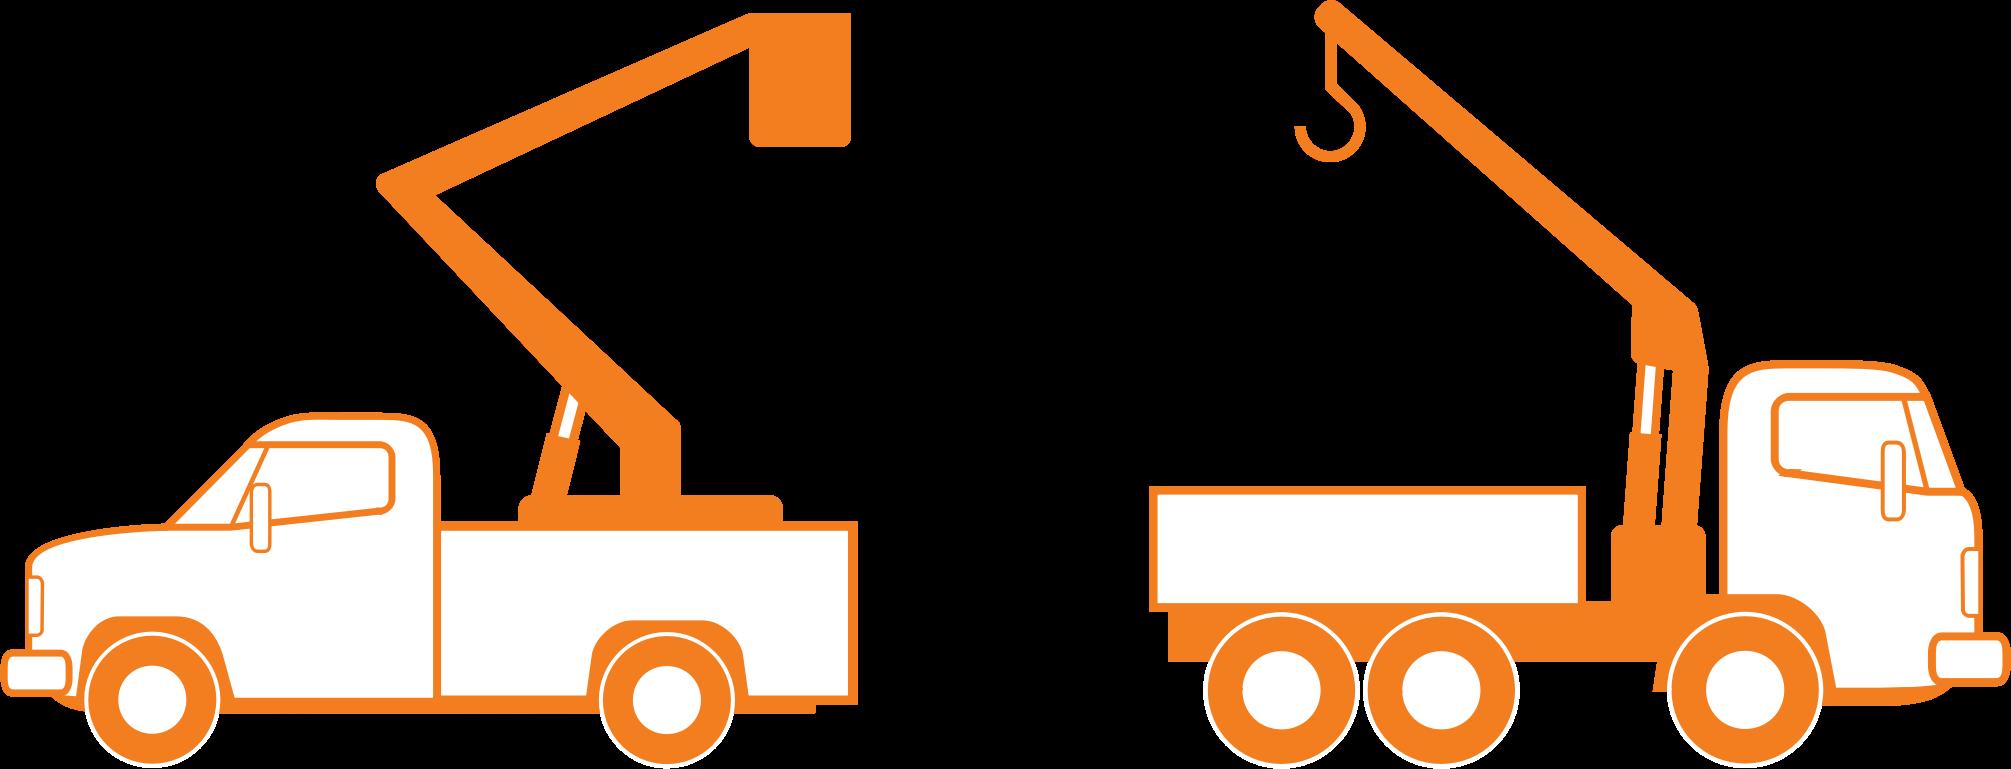 Orange Bucket Truck Clip Art Drawing Free Image